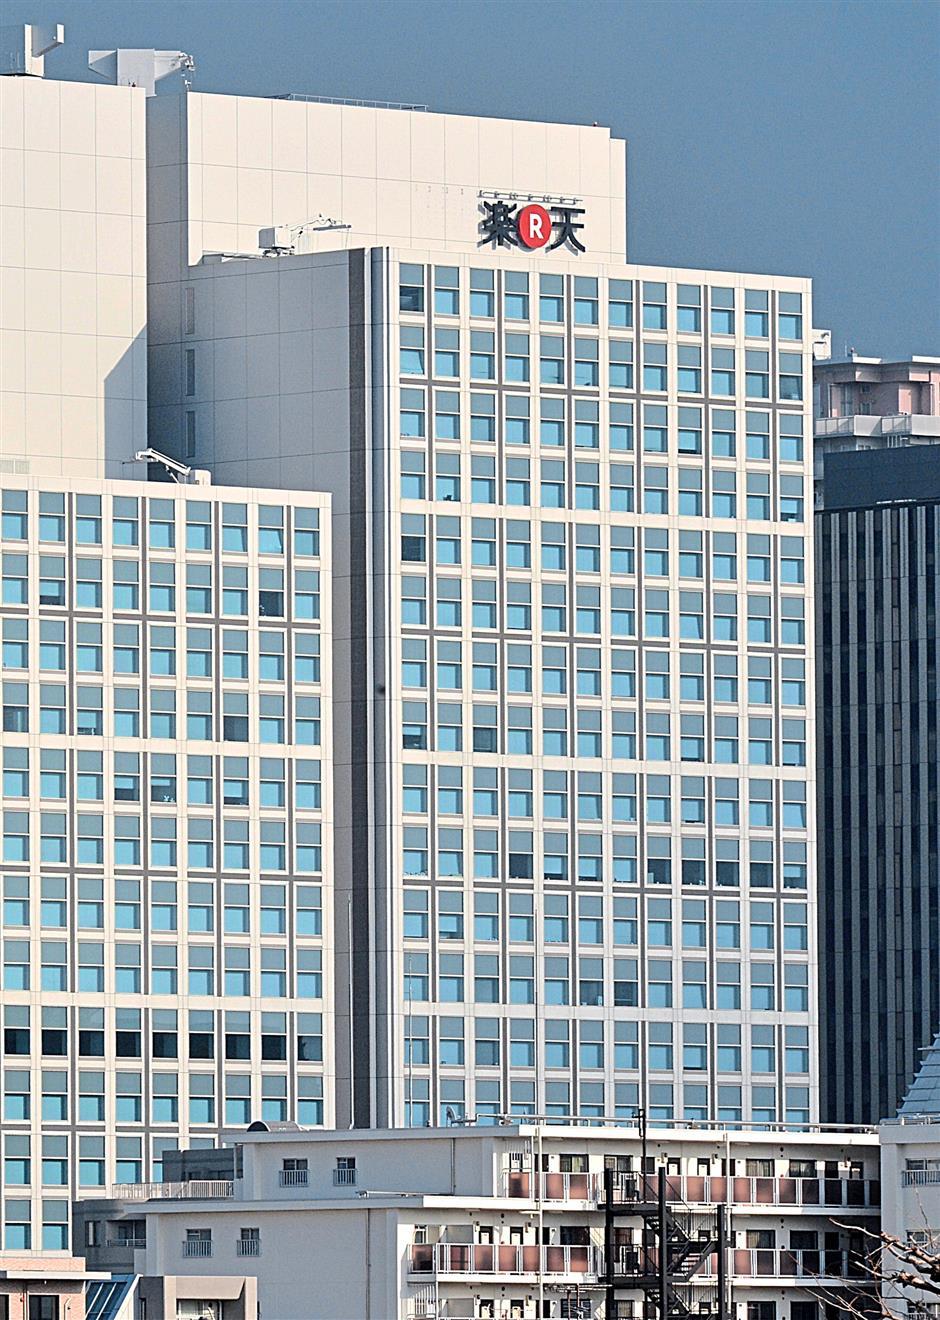 Rakuten headquarters in Tokyo. The company reported revenue of  US$4.6bil in 2012. - AFP PHOTO